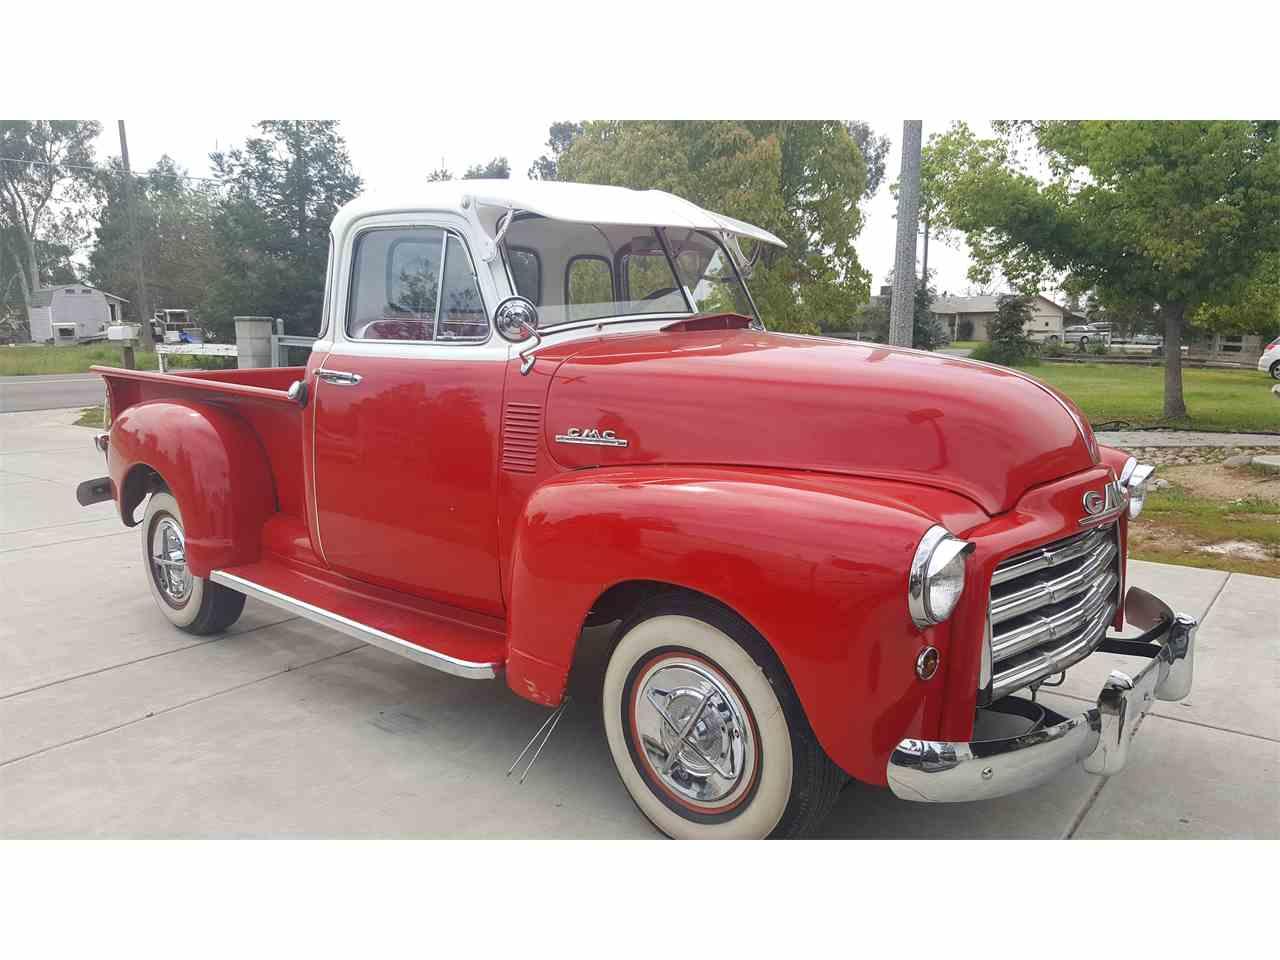 1953 gmc 1 2 ton pickup for sale cc 967037. Black Bedroom Furniture Sets. Home Design Ideas